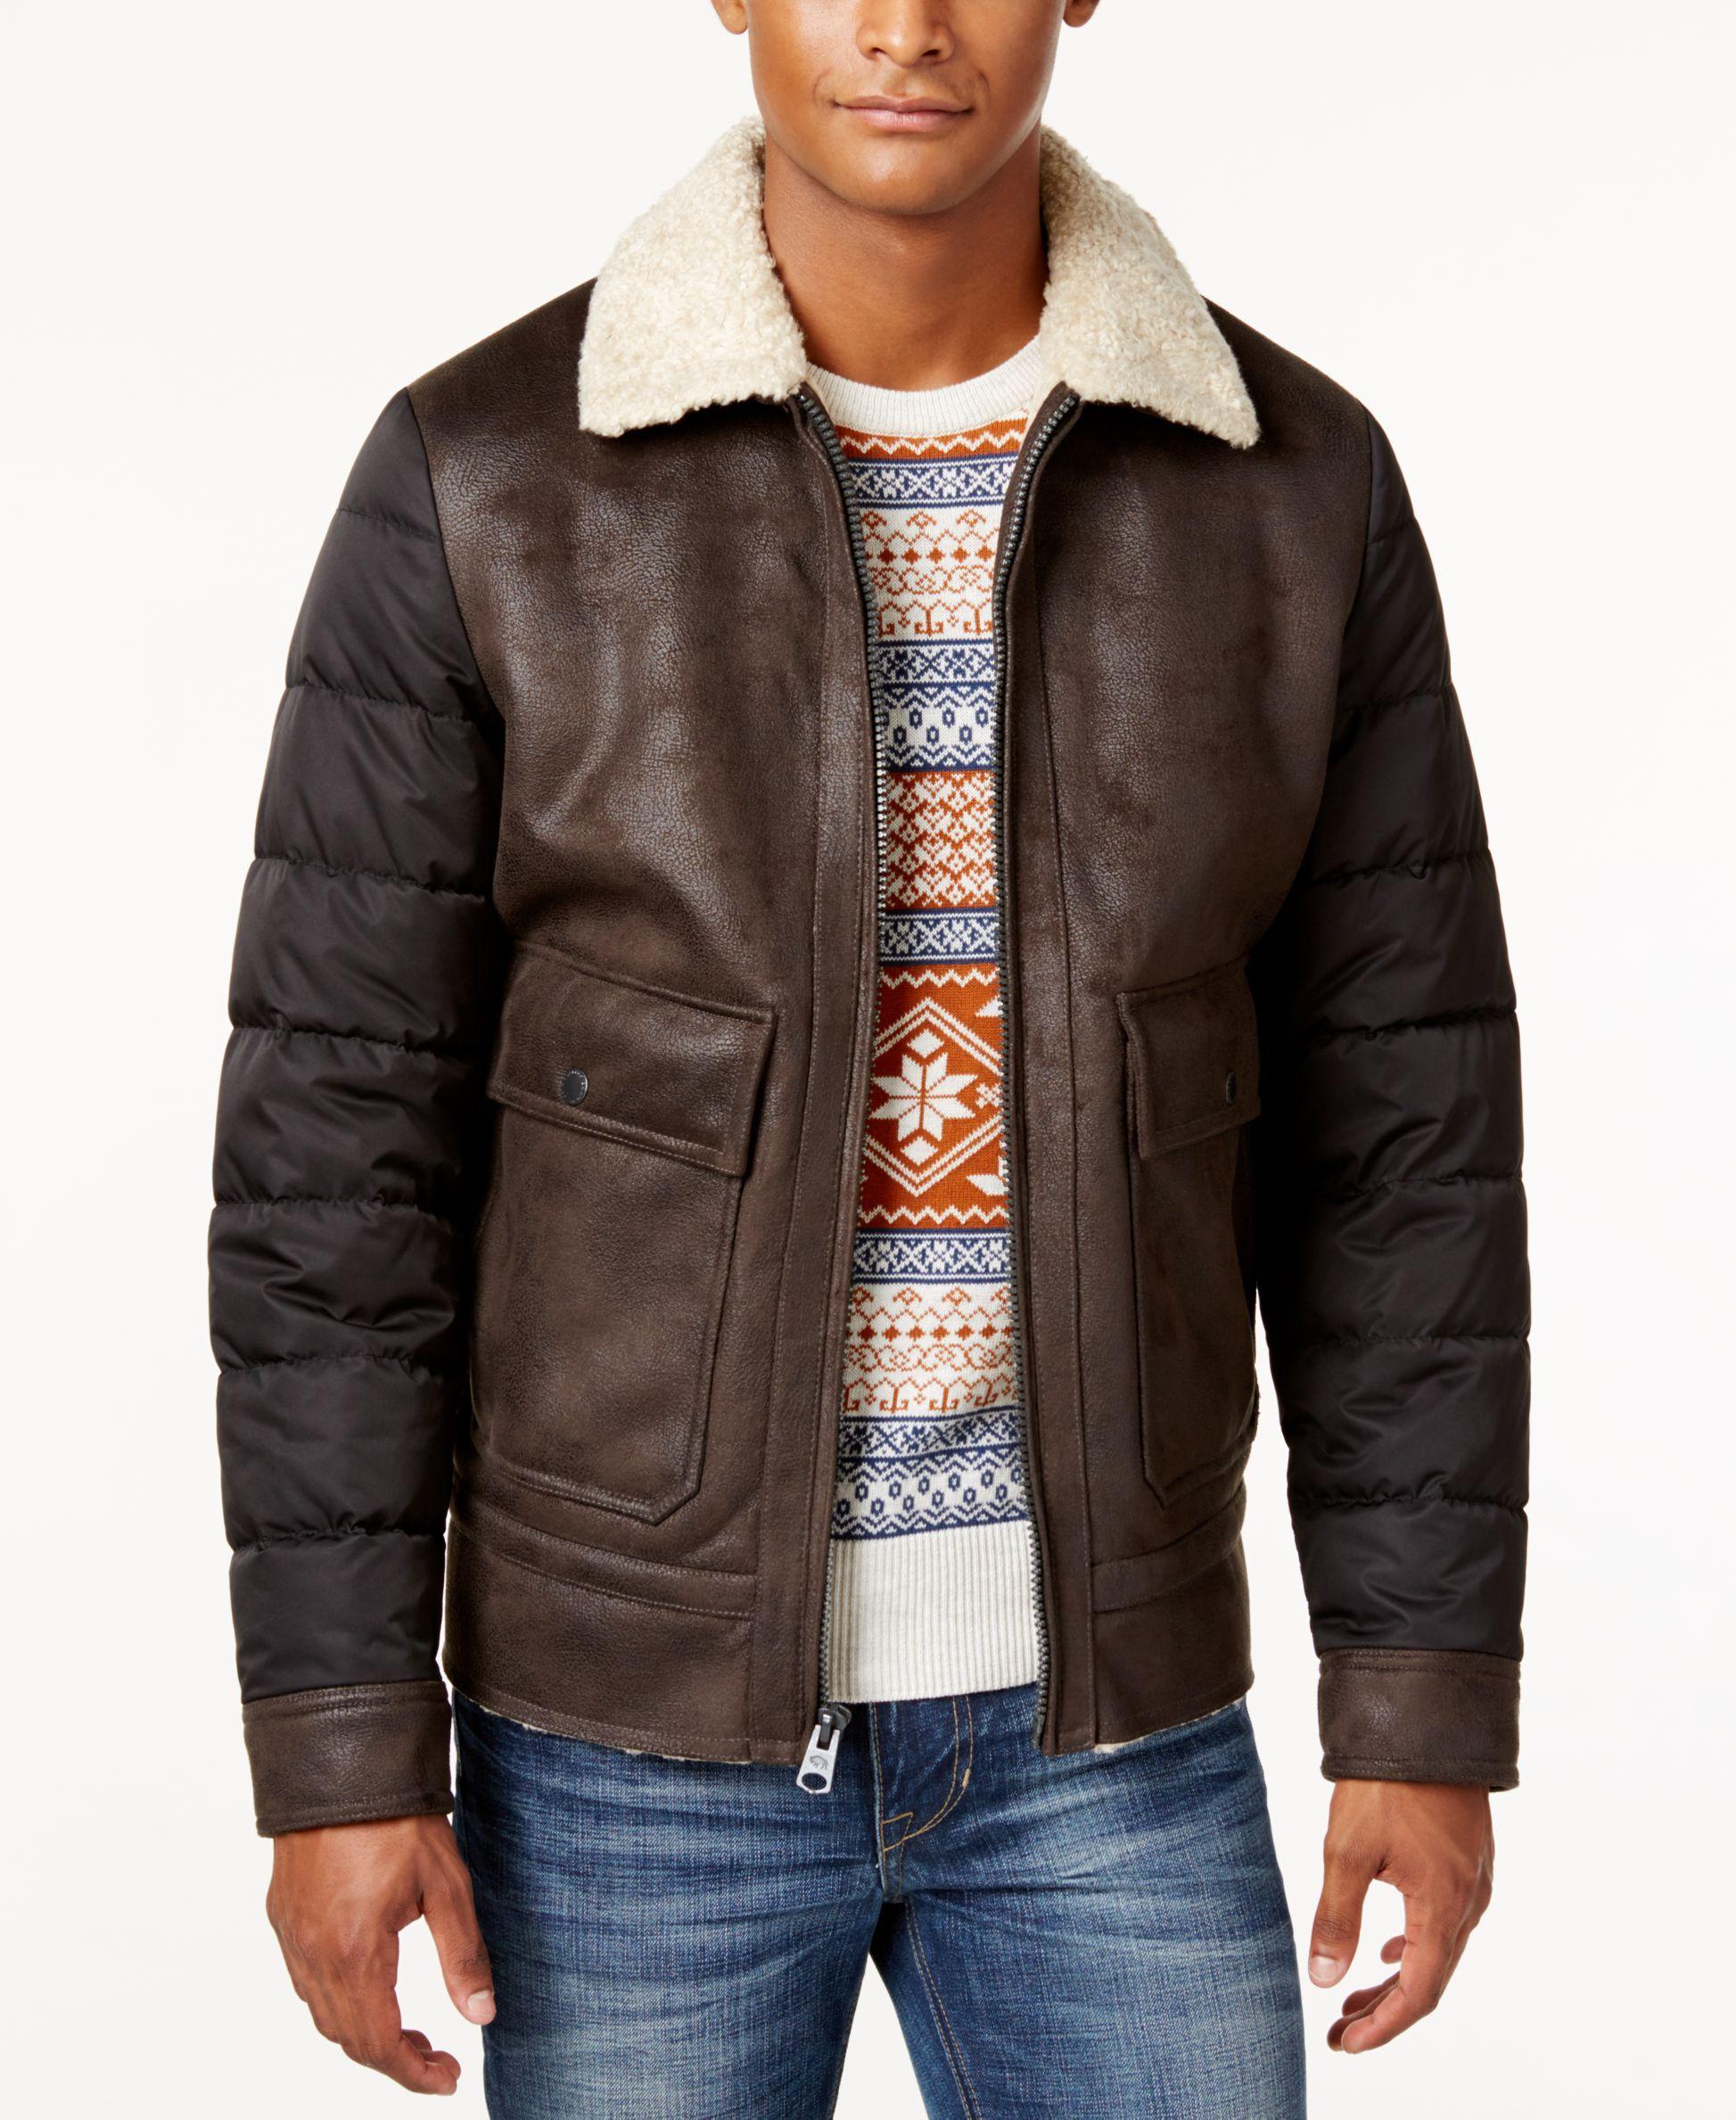 Buffalo David Bitton Men S Mixed Media Faux Shearling Jacket Faux Leather Bomber Jacket Faux Shearling Jacket Mens Big And Tall [ 2378 x 1947 Pixel ]